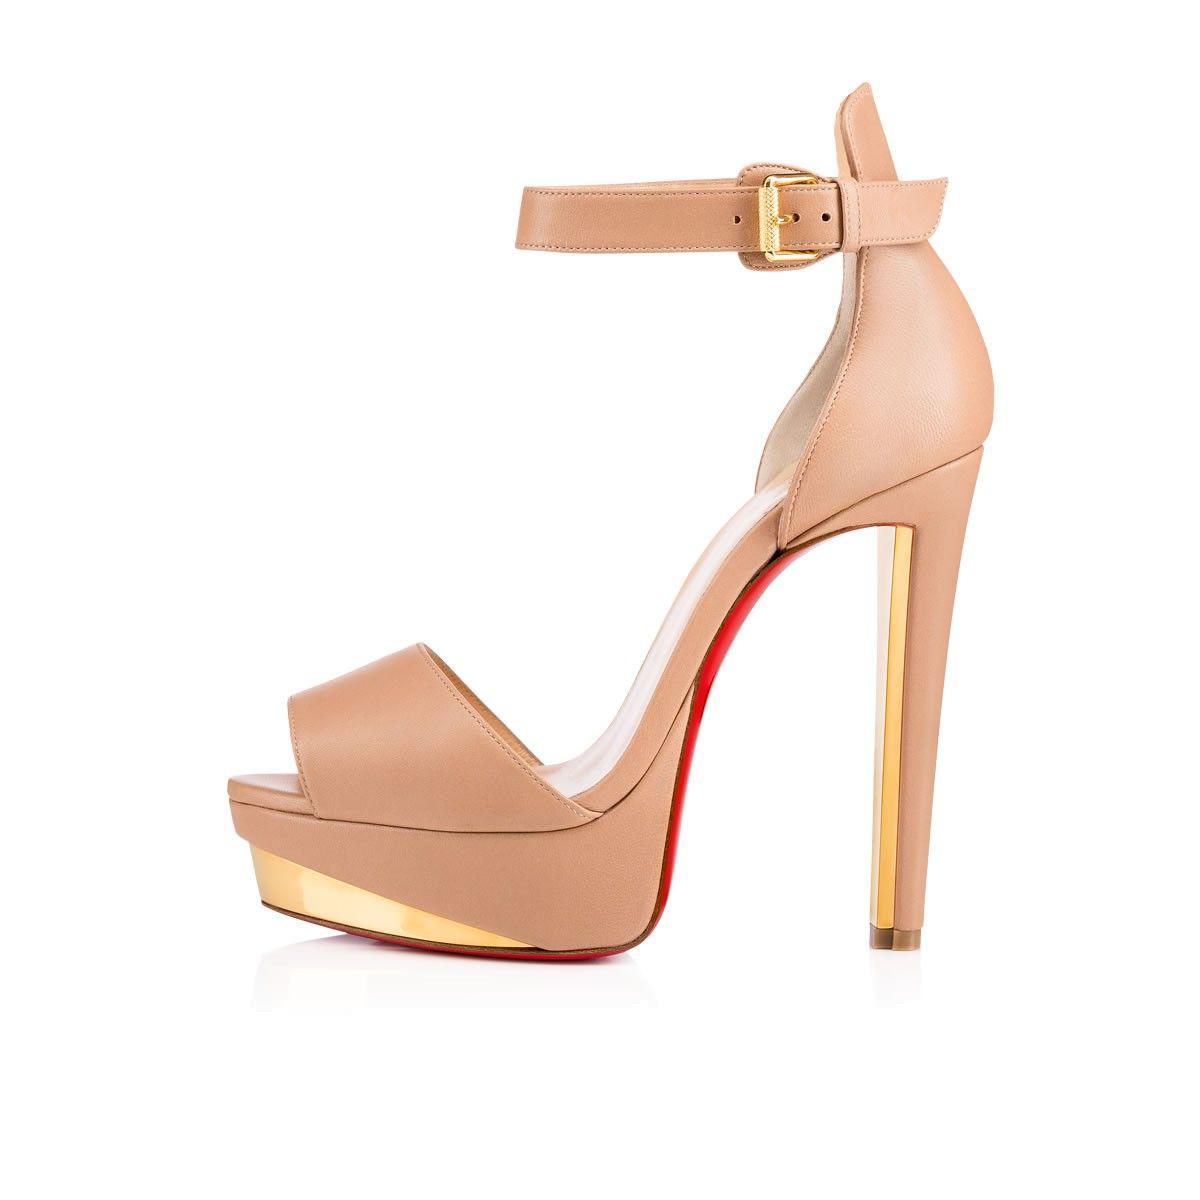 Christian Louboutin Tuctopen 140 Platform Sandals find great sale online F7ZCOptm